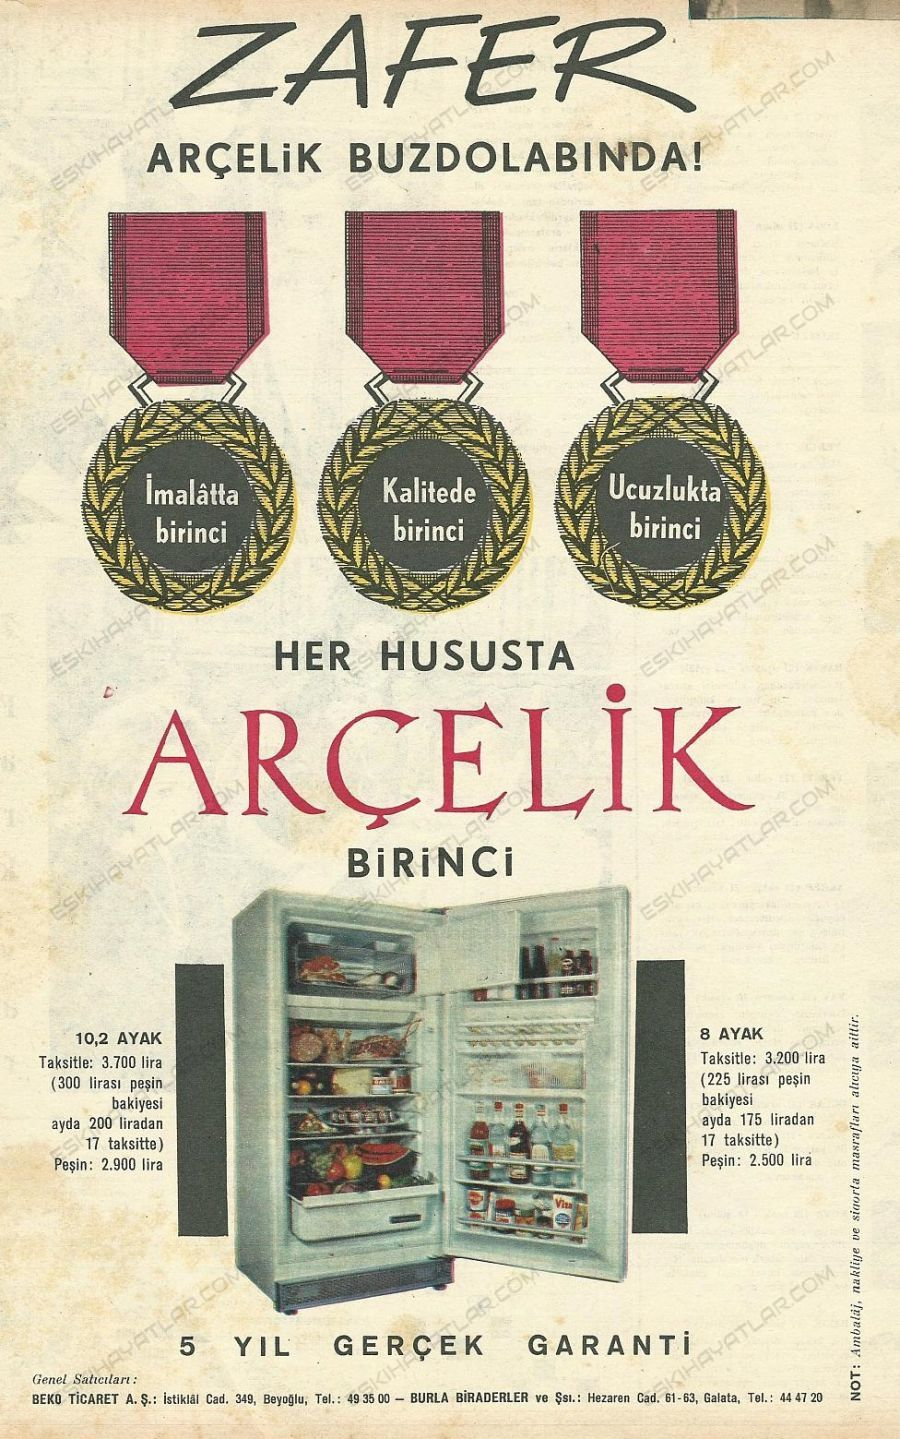 0335-zafer-arcelik-buzdolaplarinda-1964-yilinda-arcelik-reklamlari